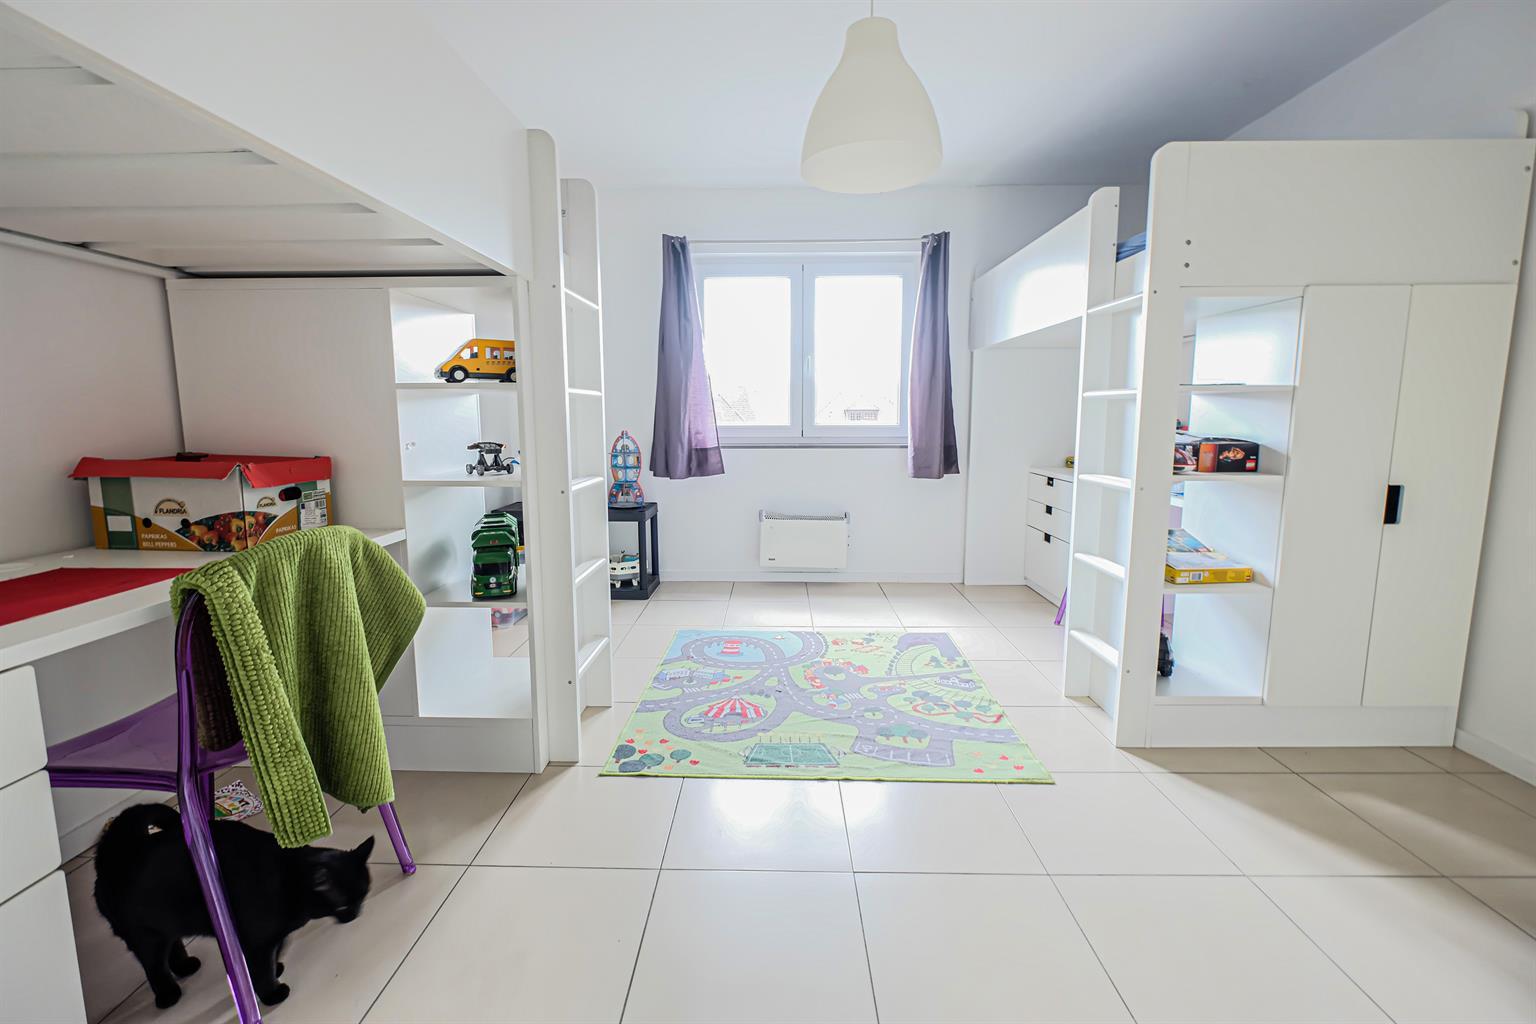 Duplex - Braine-le-Comte - #4328614-5